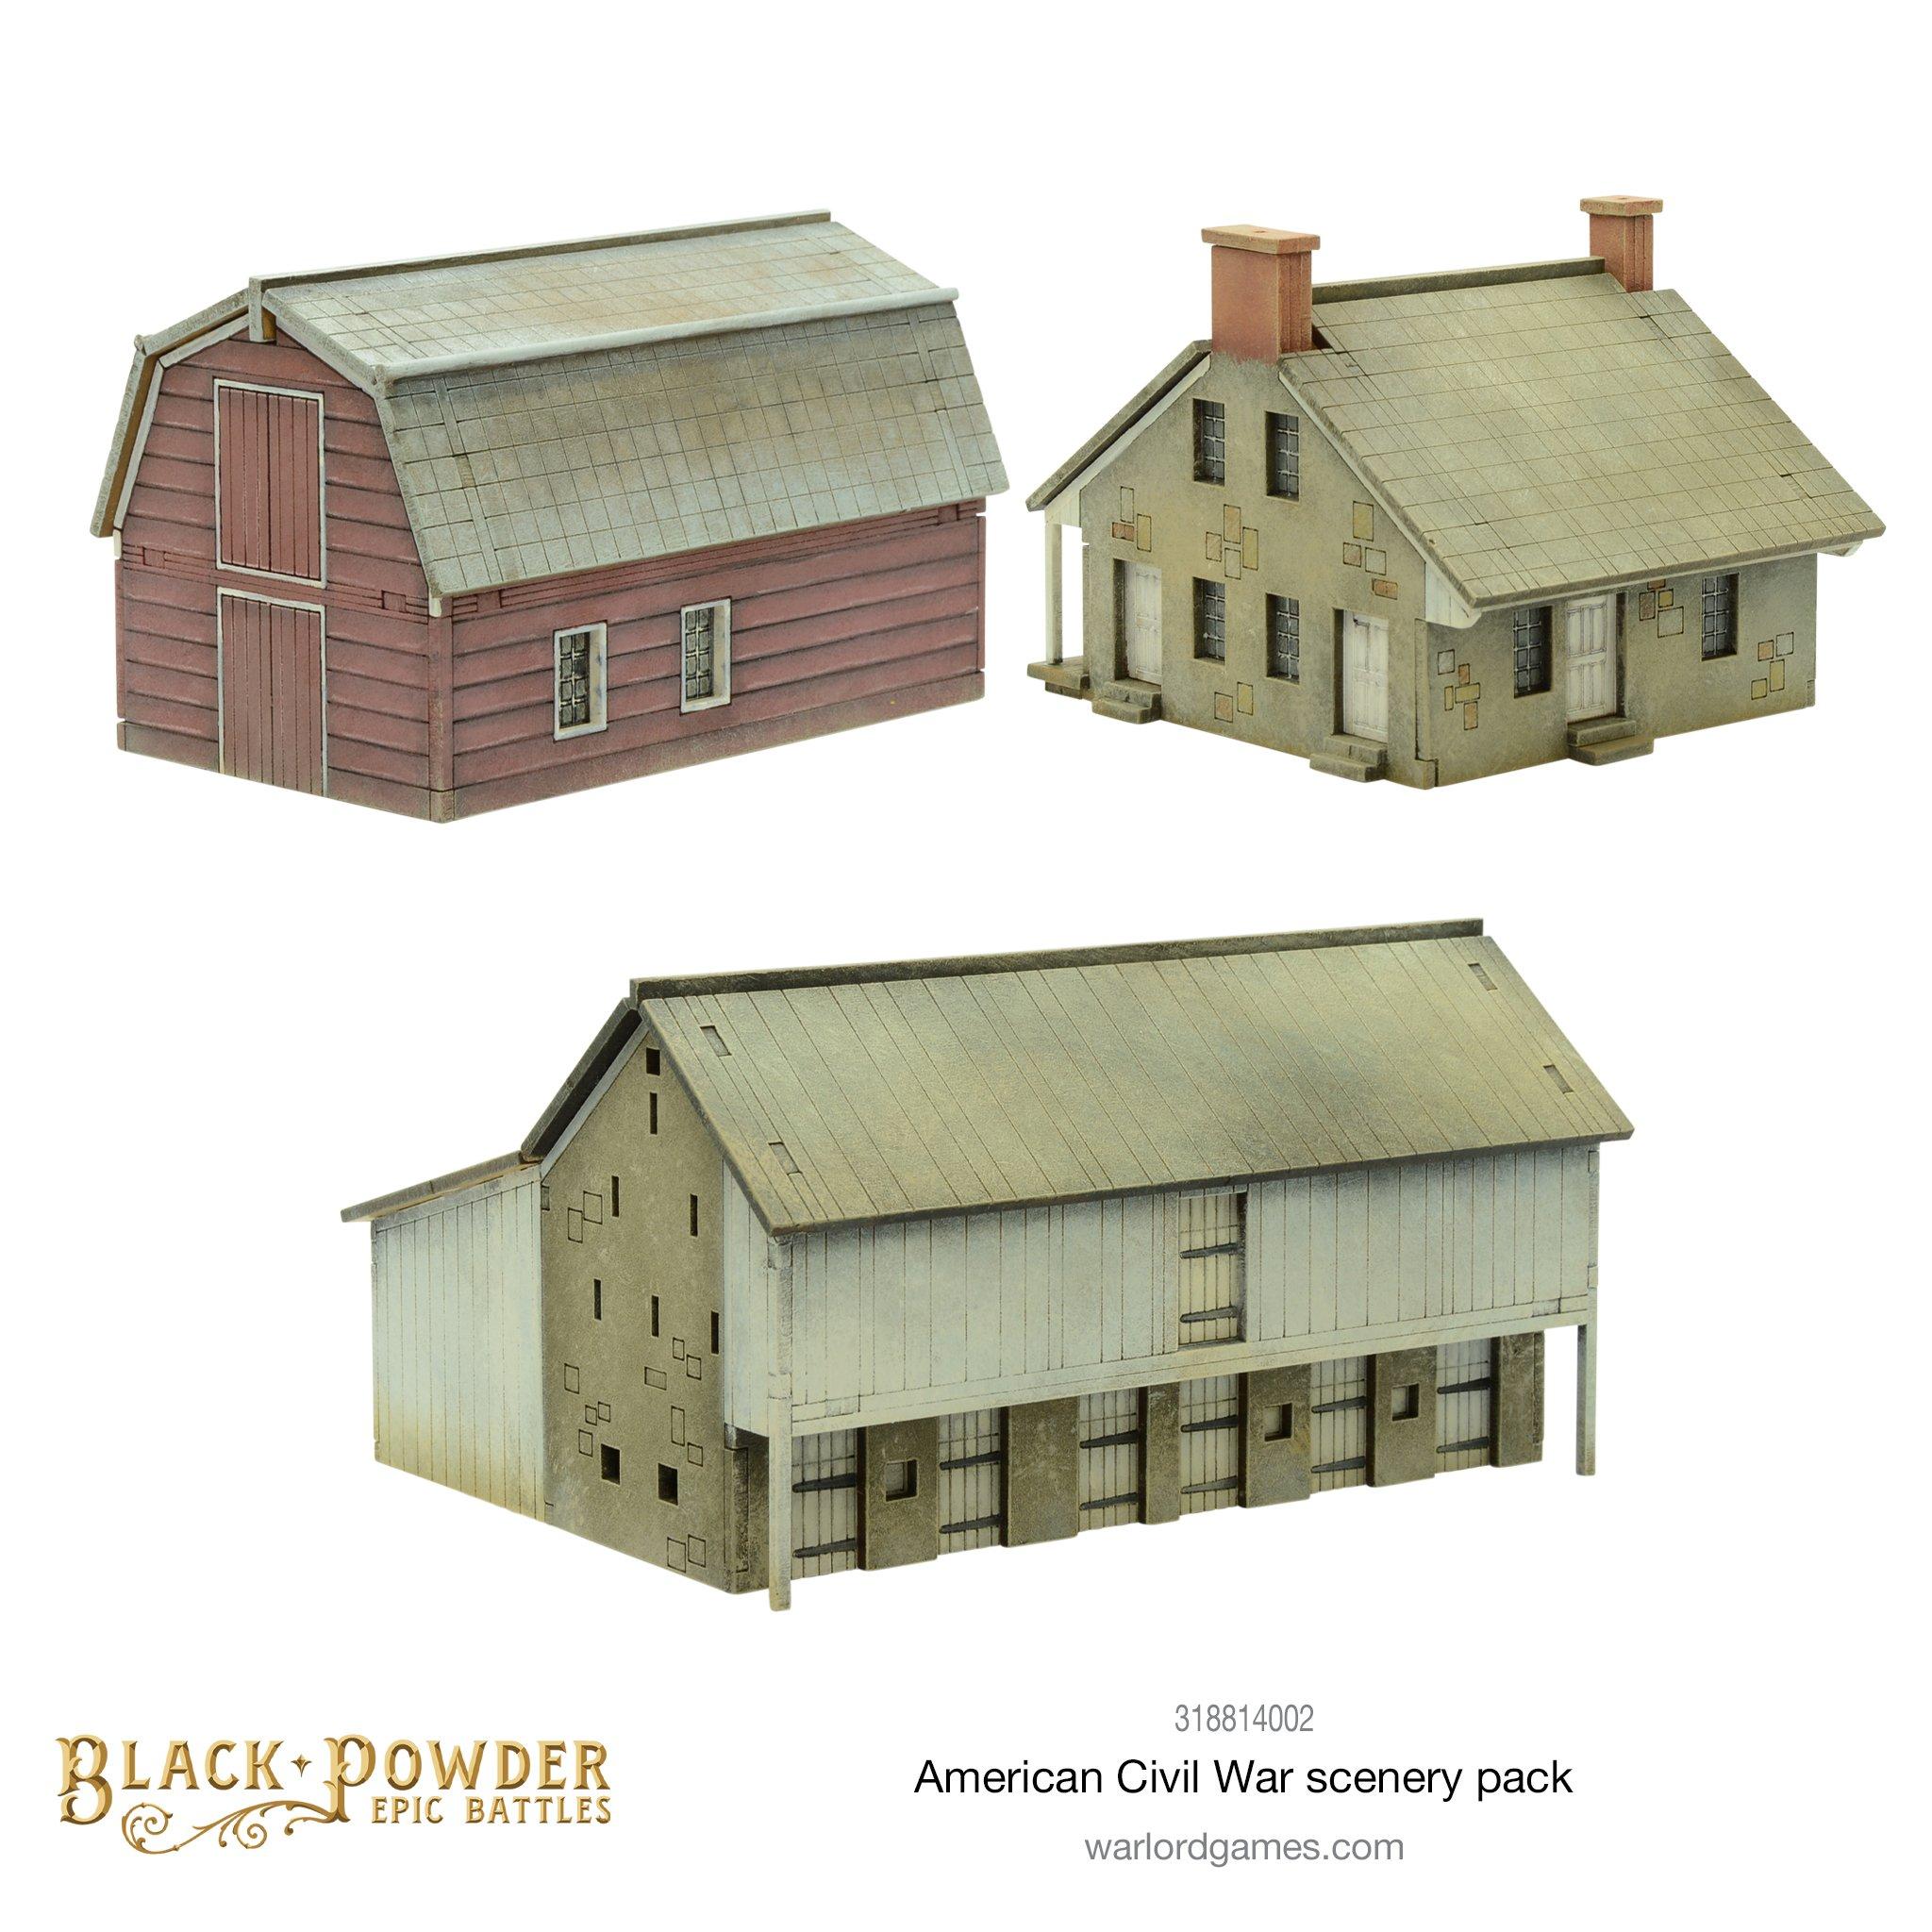 Black Powder Epic Battles : American Civil War Scenery Pack